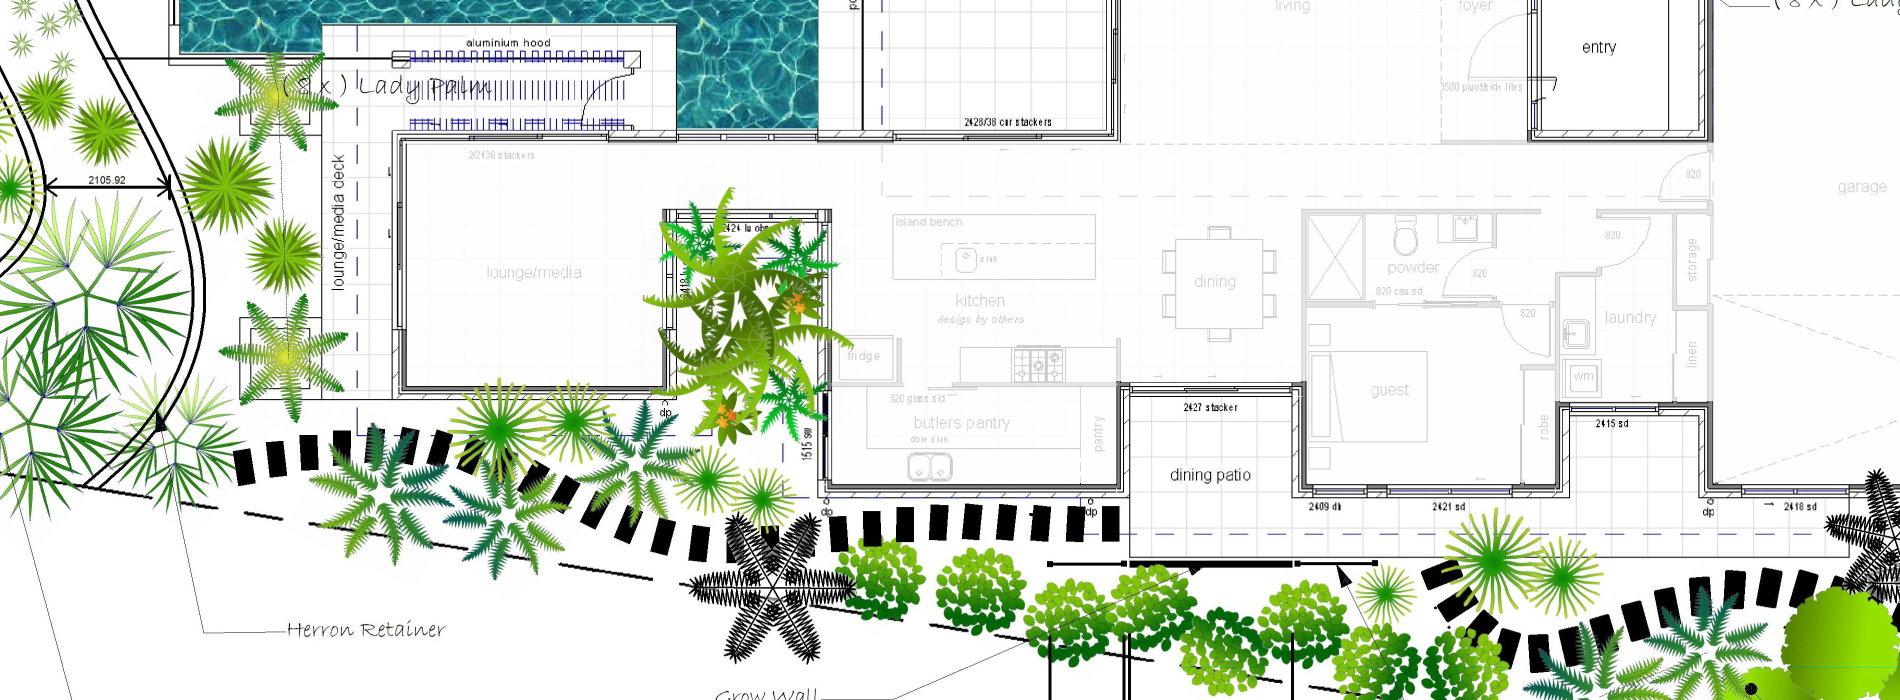 landscape cad plan